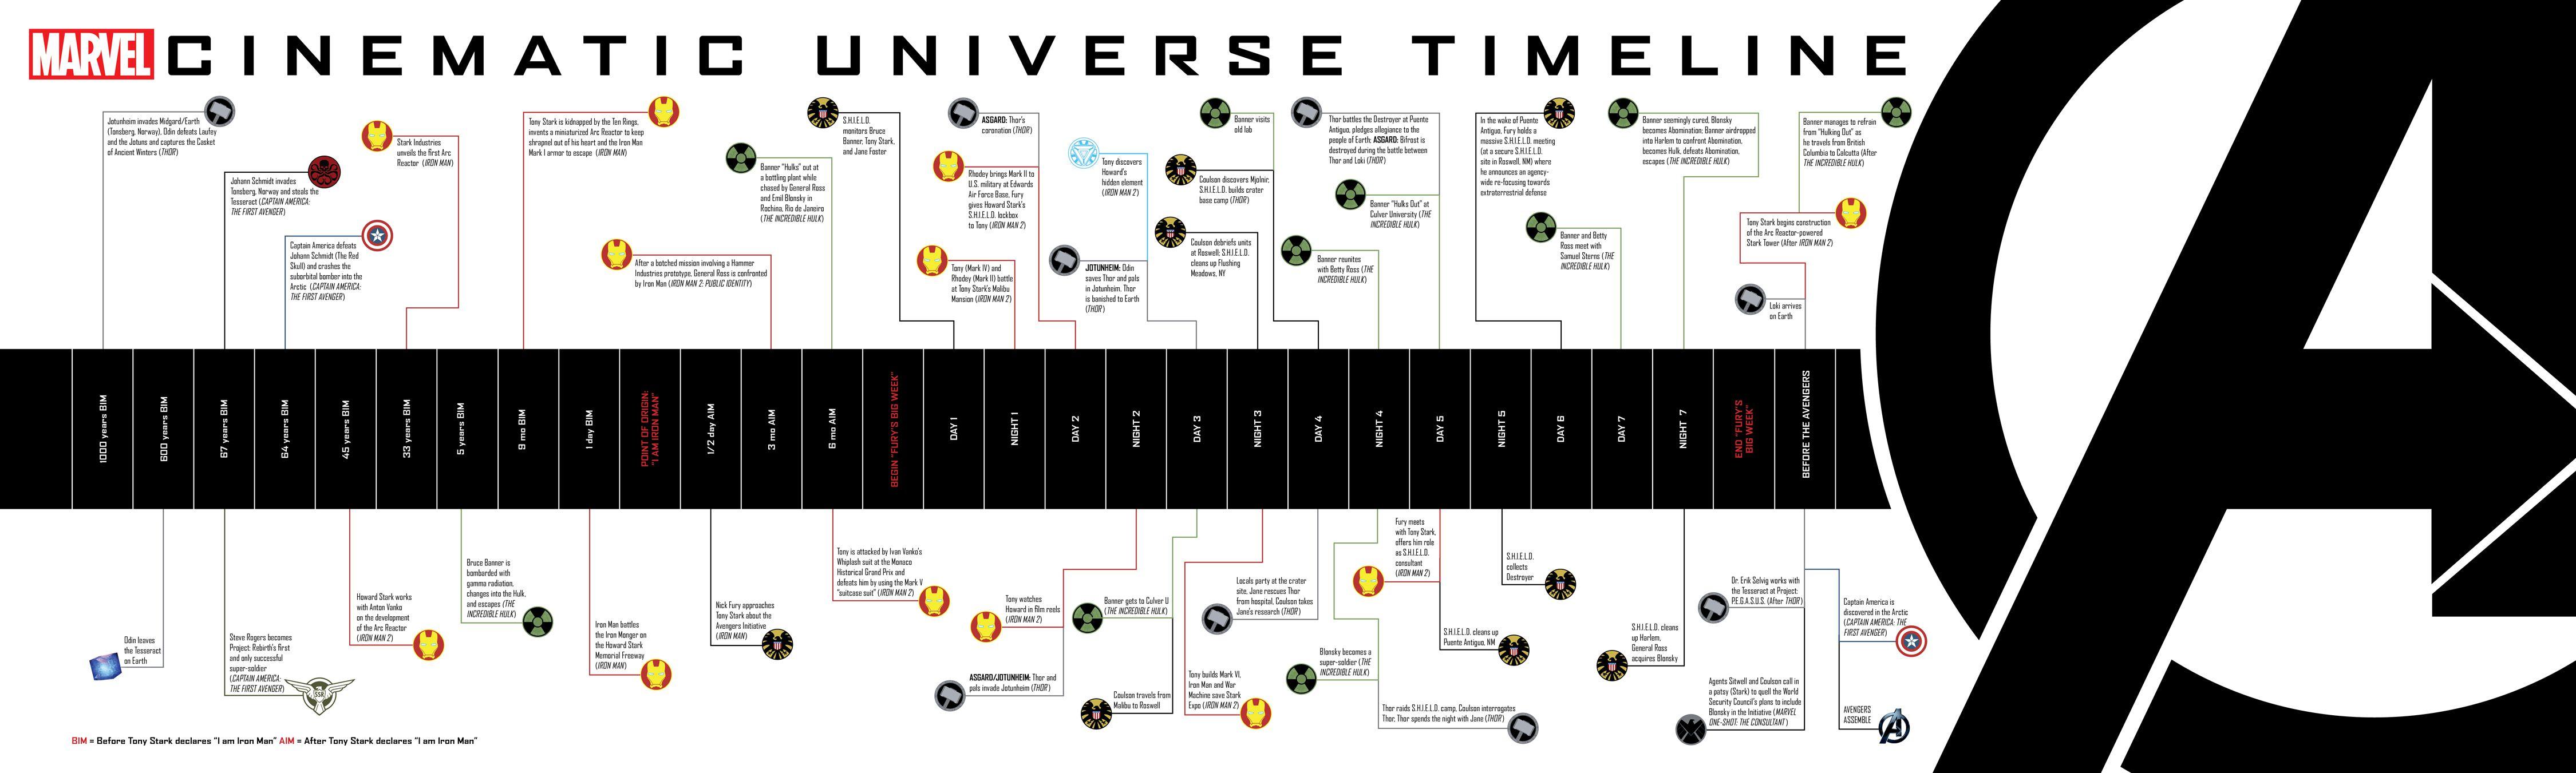 Marvel Universum Chronologie